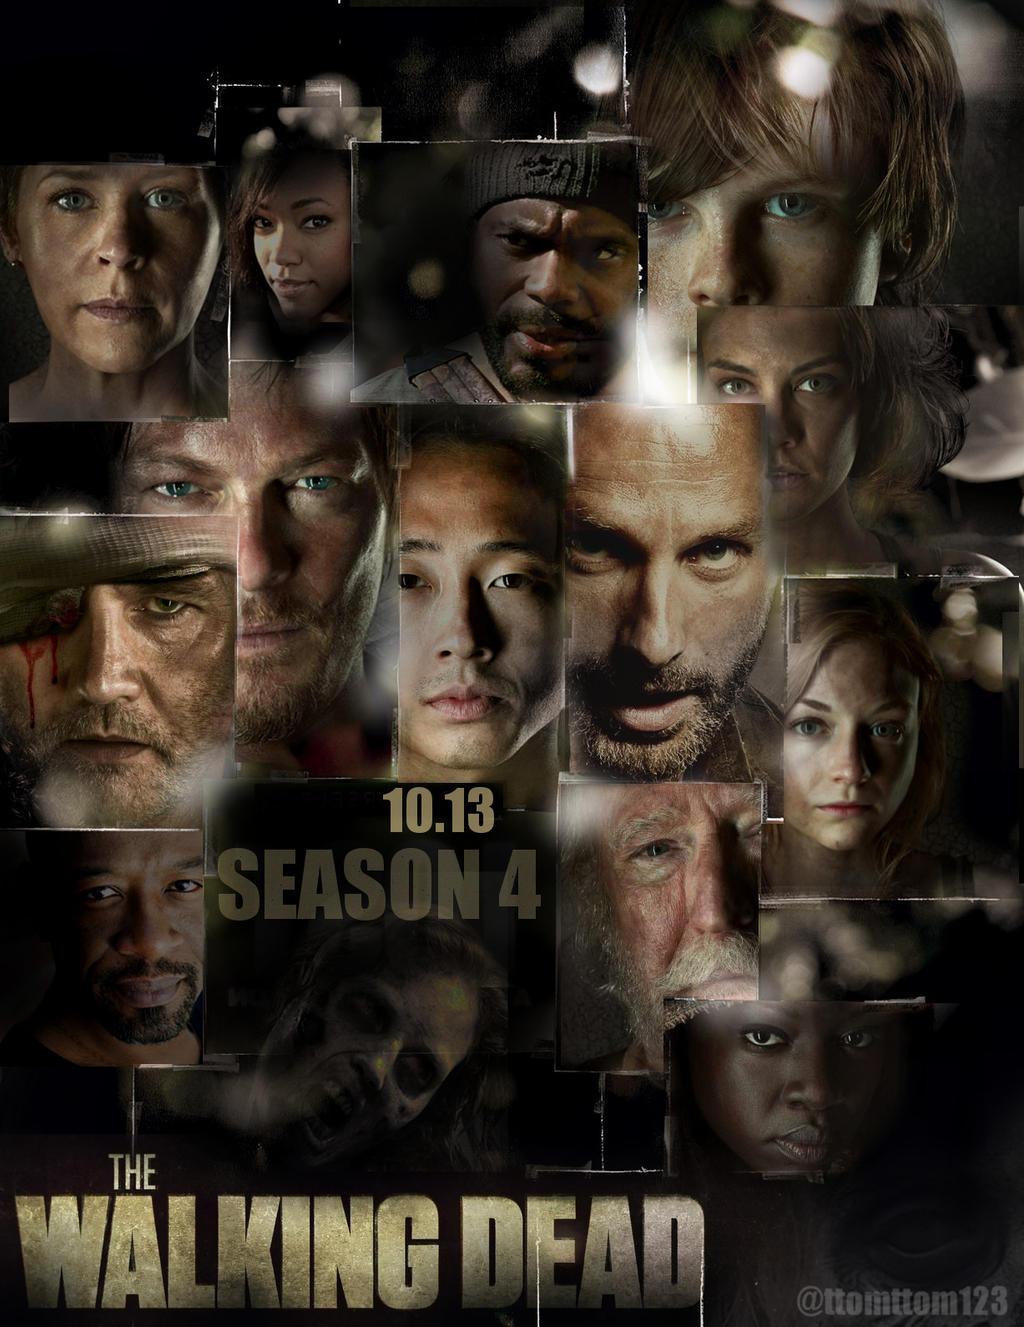 The Walking Dead - 4ª Temporada Completa [AVI / MKV - HDTV + 720p - Dual Áudio] - Torrent